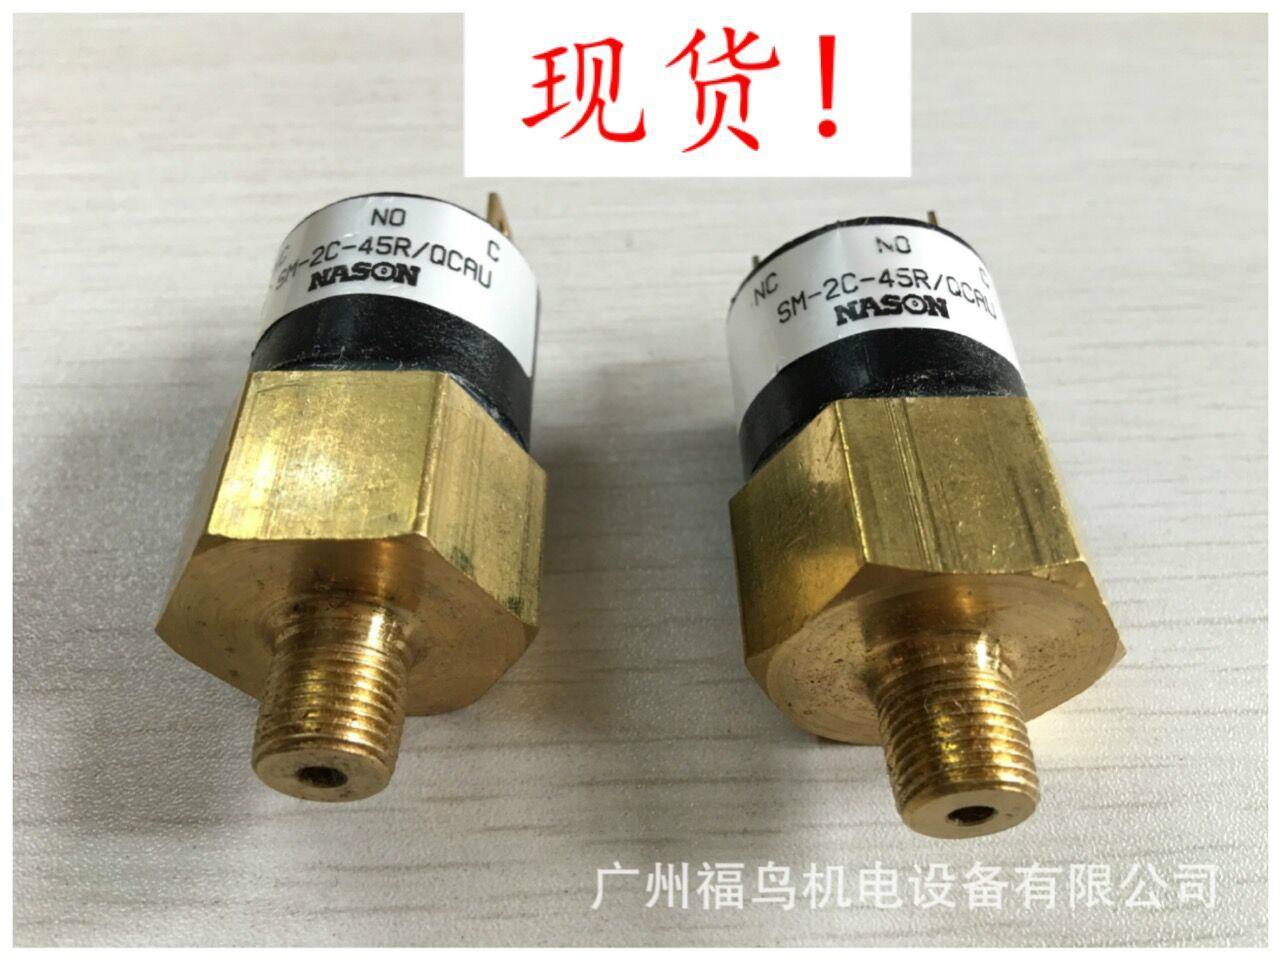 NASON壓力開關, 型號: SM-2C-45R/QCAU